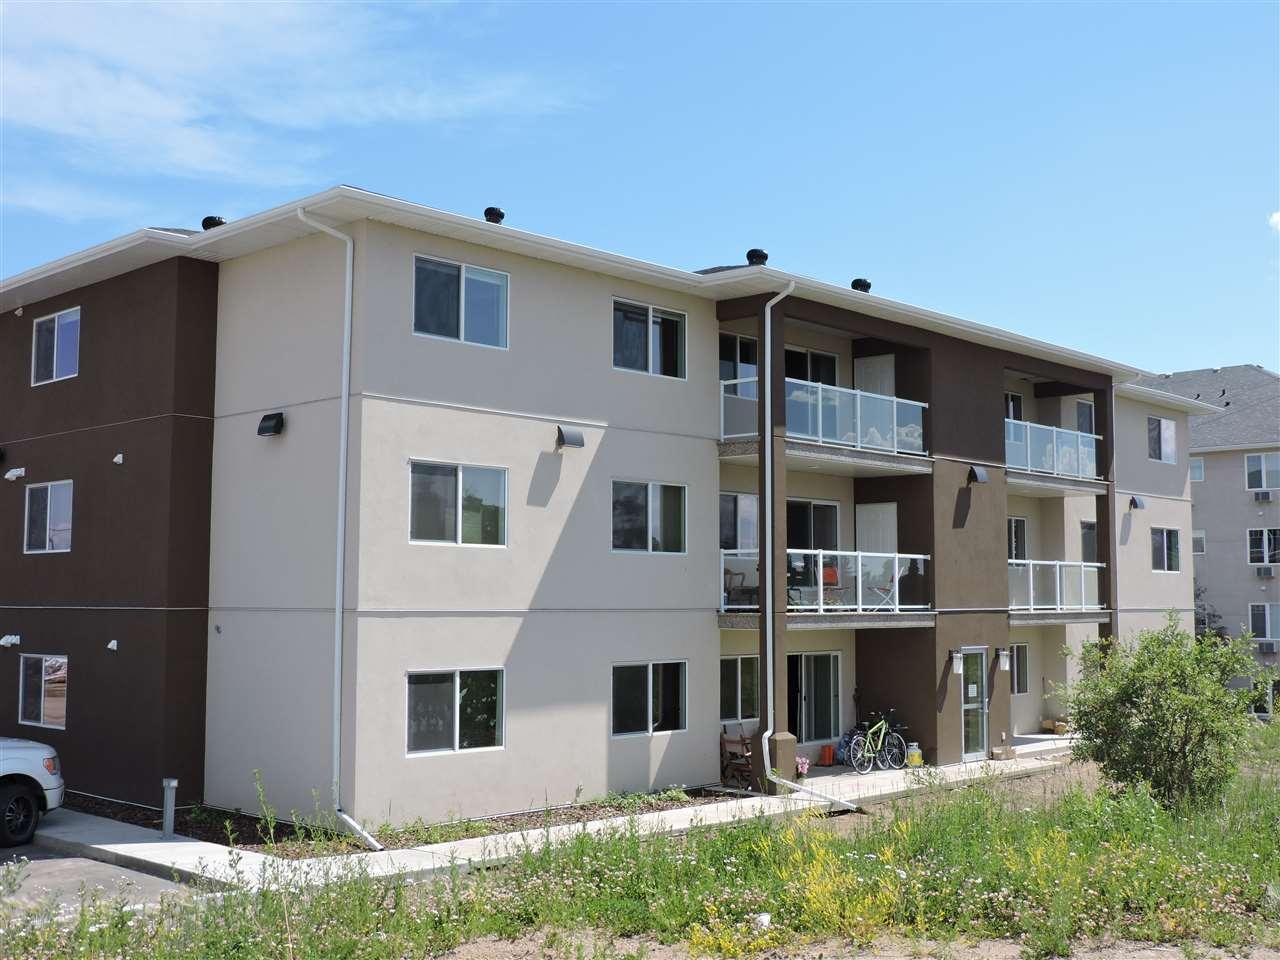 Buliding: 1601 8 Avenue, Cold Lake, AB